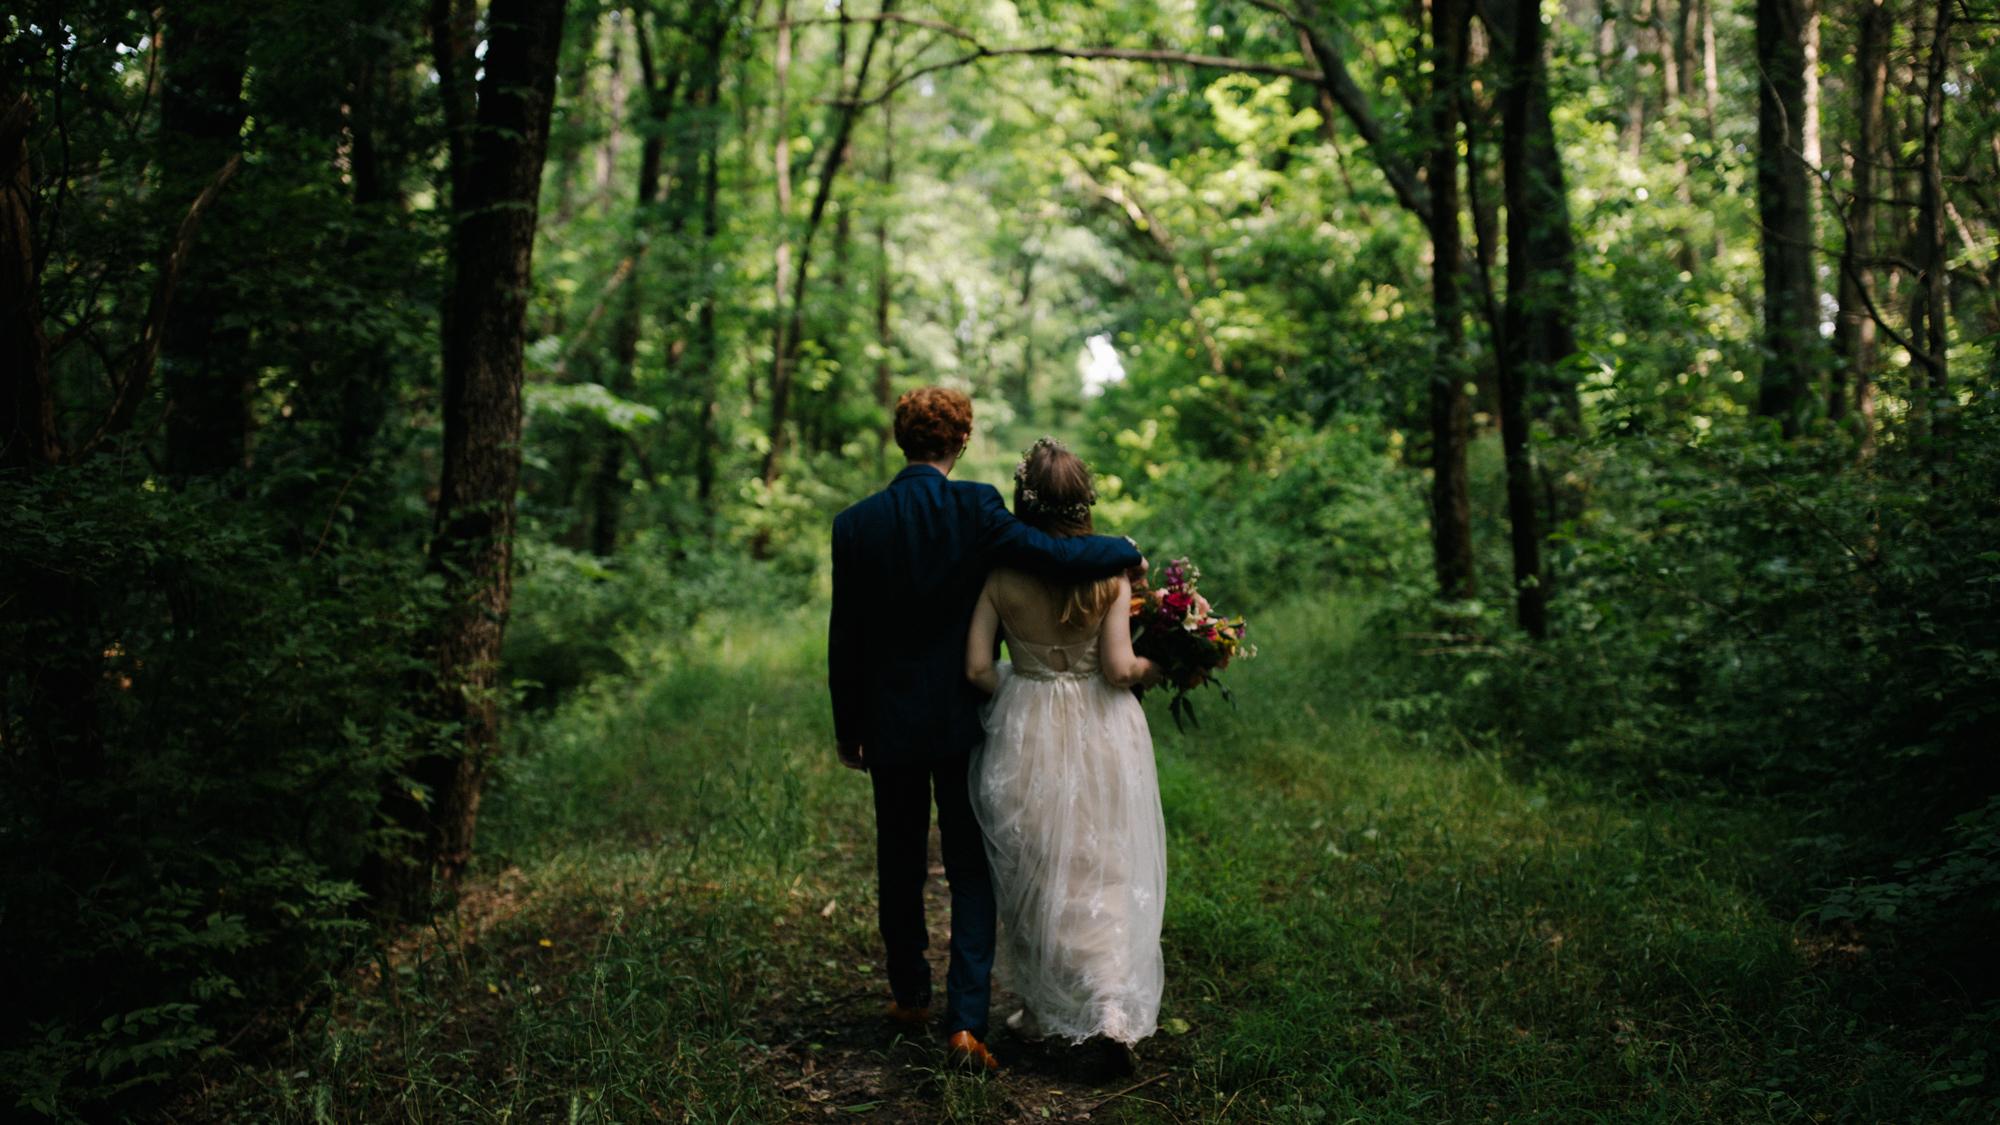 alec_vanderboom_kansas_city_mo_wedding_photos-0090.jpg